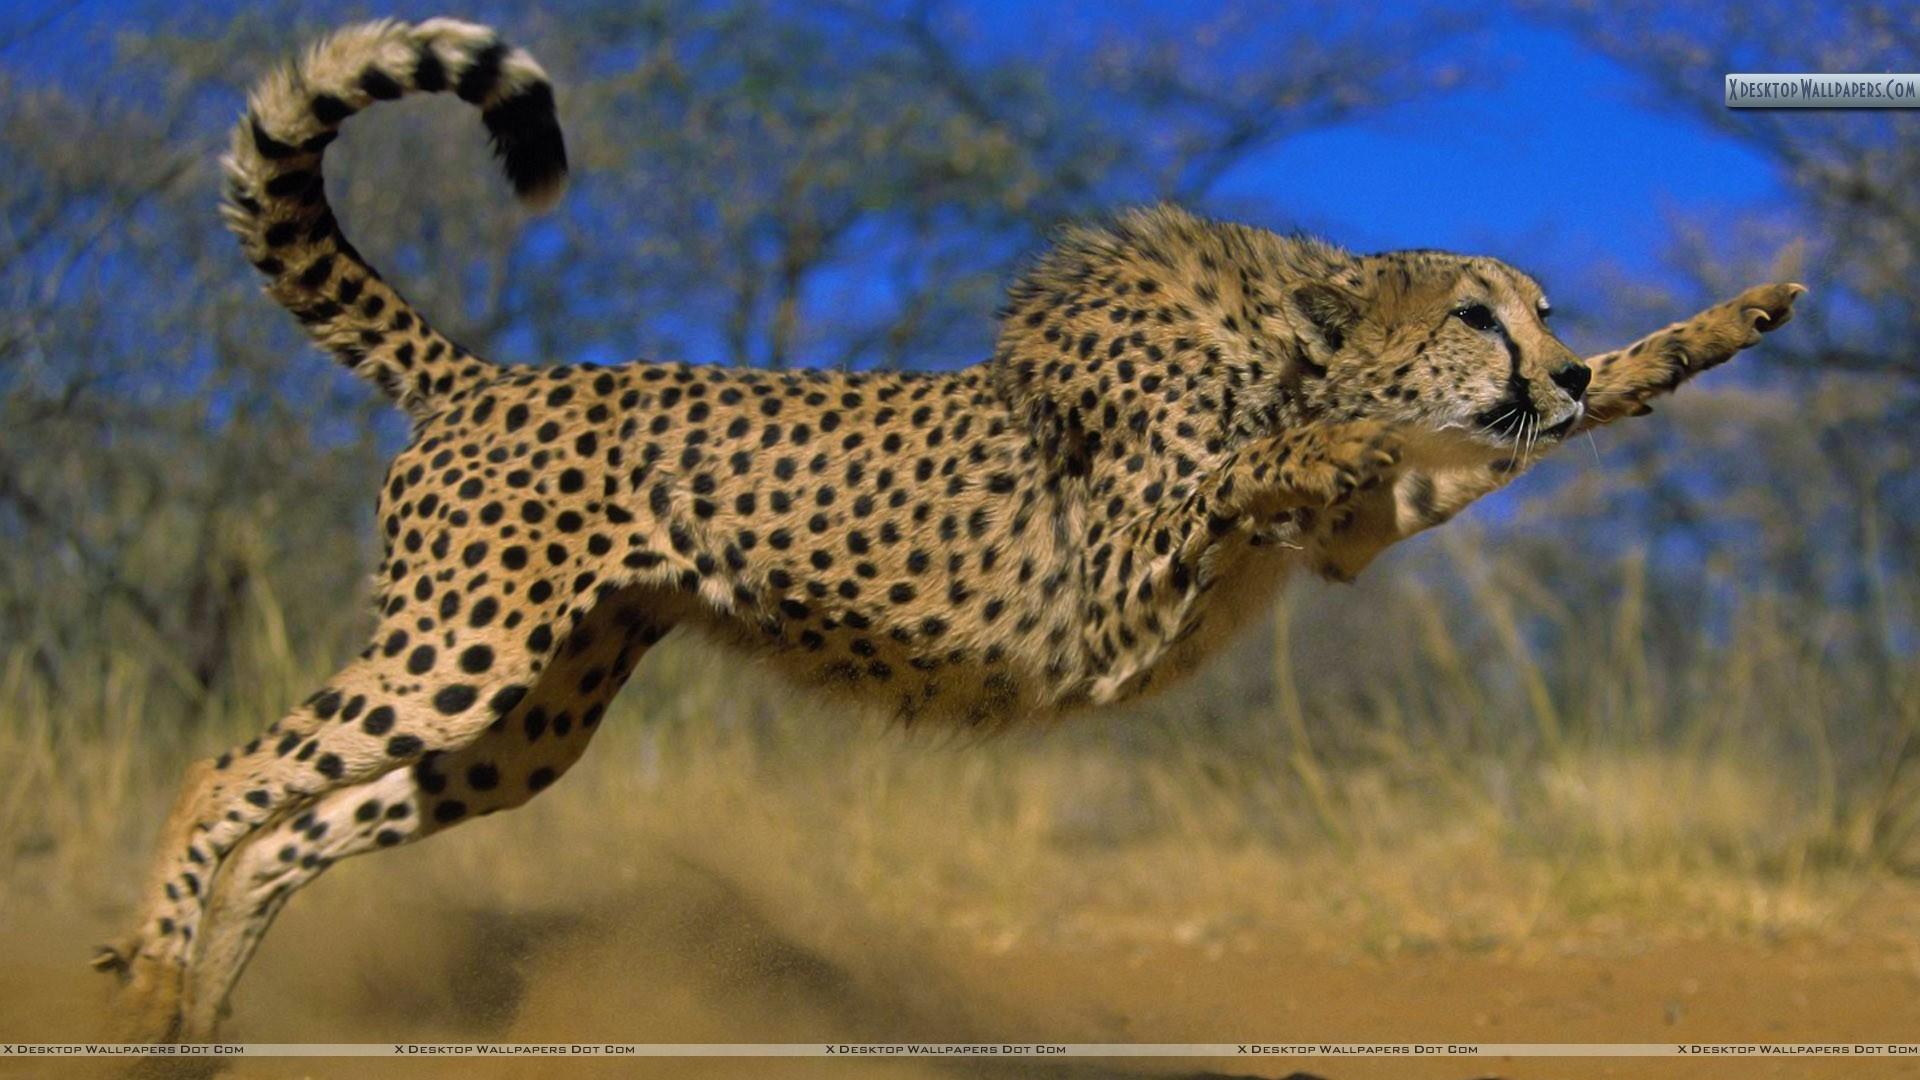 Res: 1920x1080, Cheetah Wallpaper 84